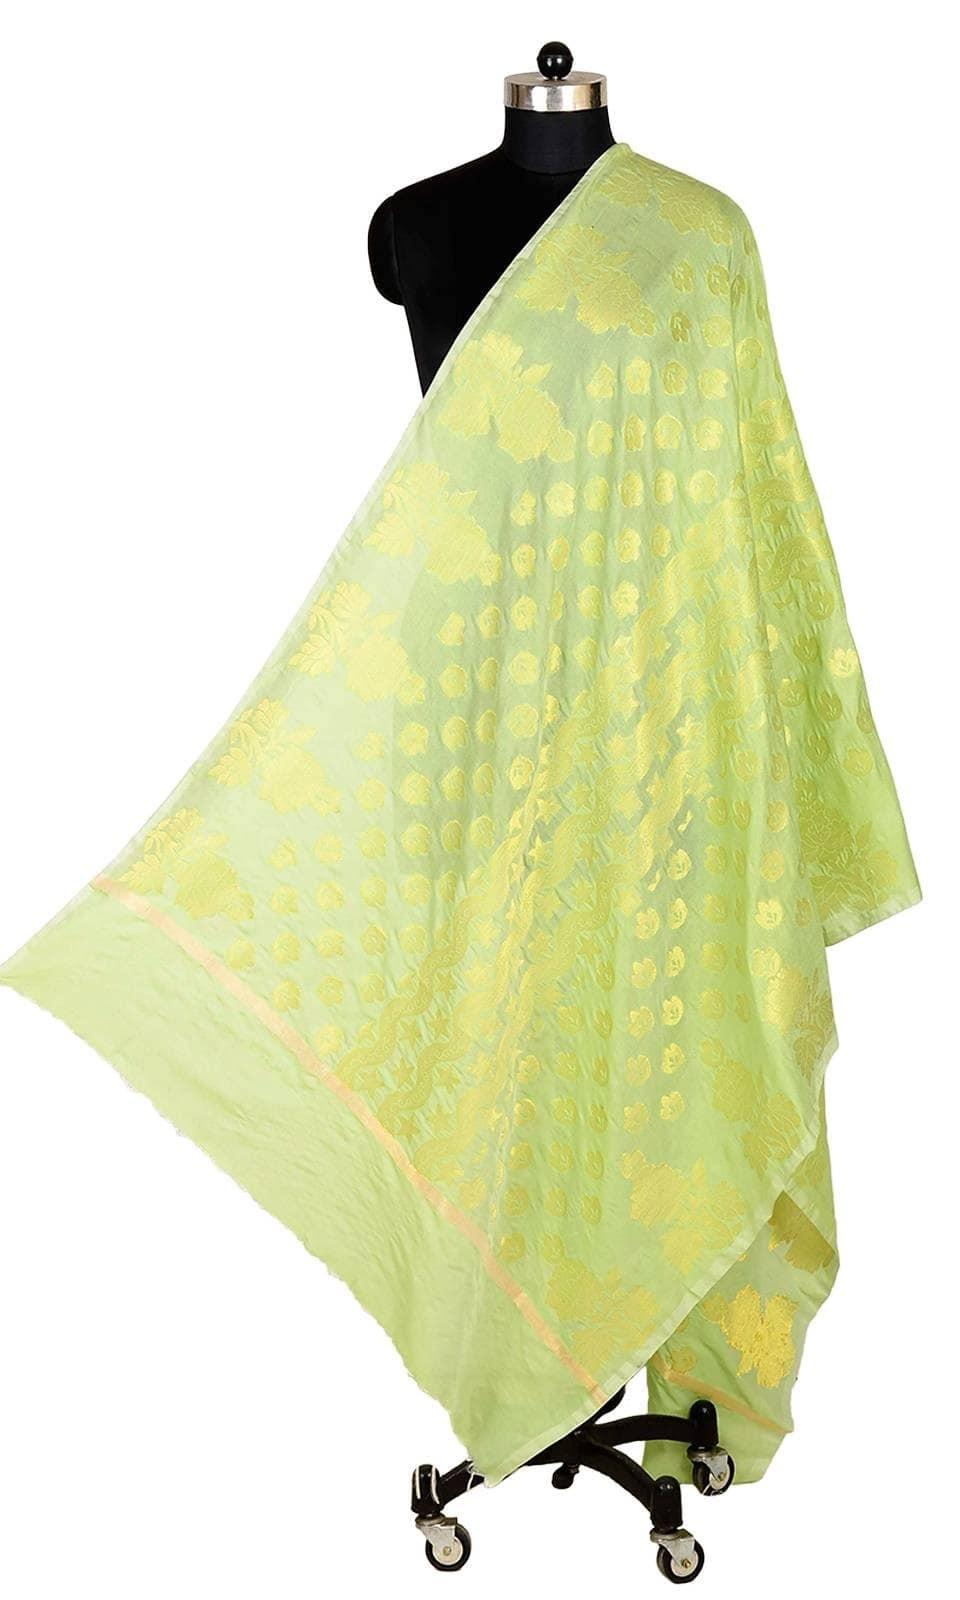 Green Color Banarasi Silk Dupatta  • Pure Banarasi Silk Dupatta • Fabric : Banarasi Silk • Dupatta Size : 100 inches X 36 inches  SKU: DUP0080-Light-Green Rs. 799.00  at Best Price online at #IshiMaya #happynewyears #happynewyear2018 #christmasparty #x-mas